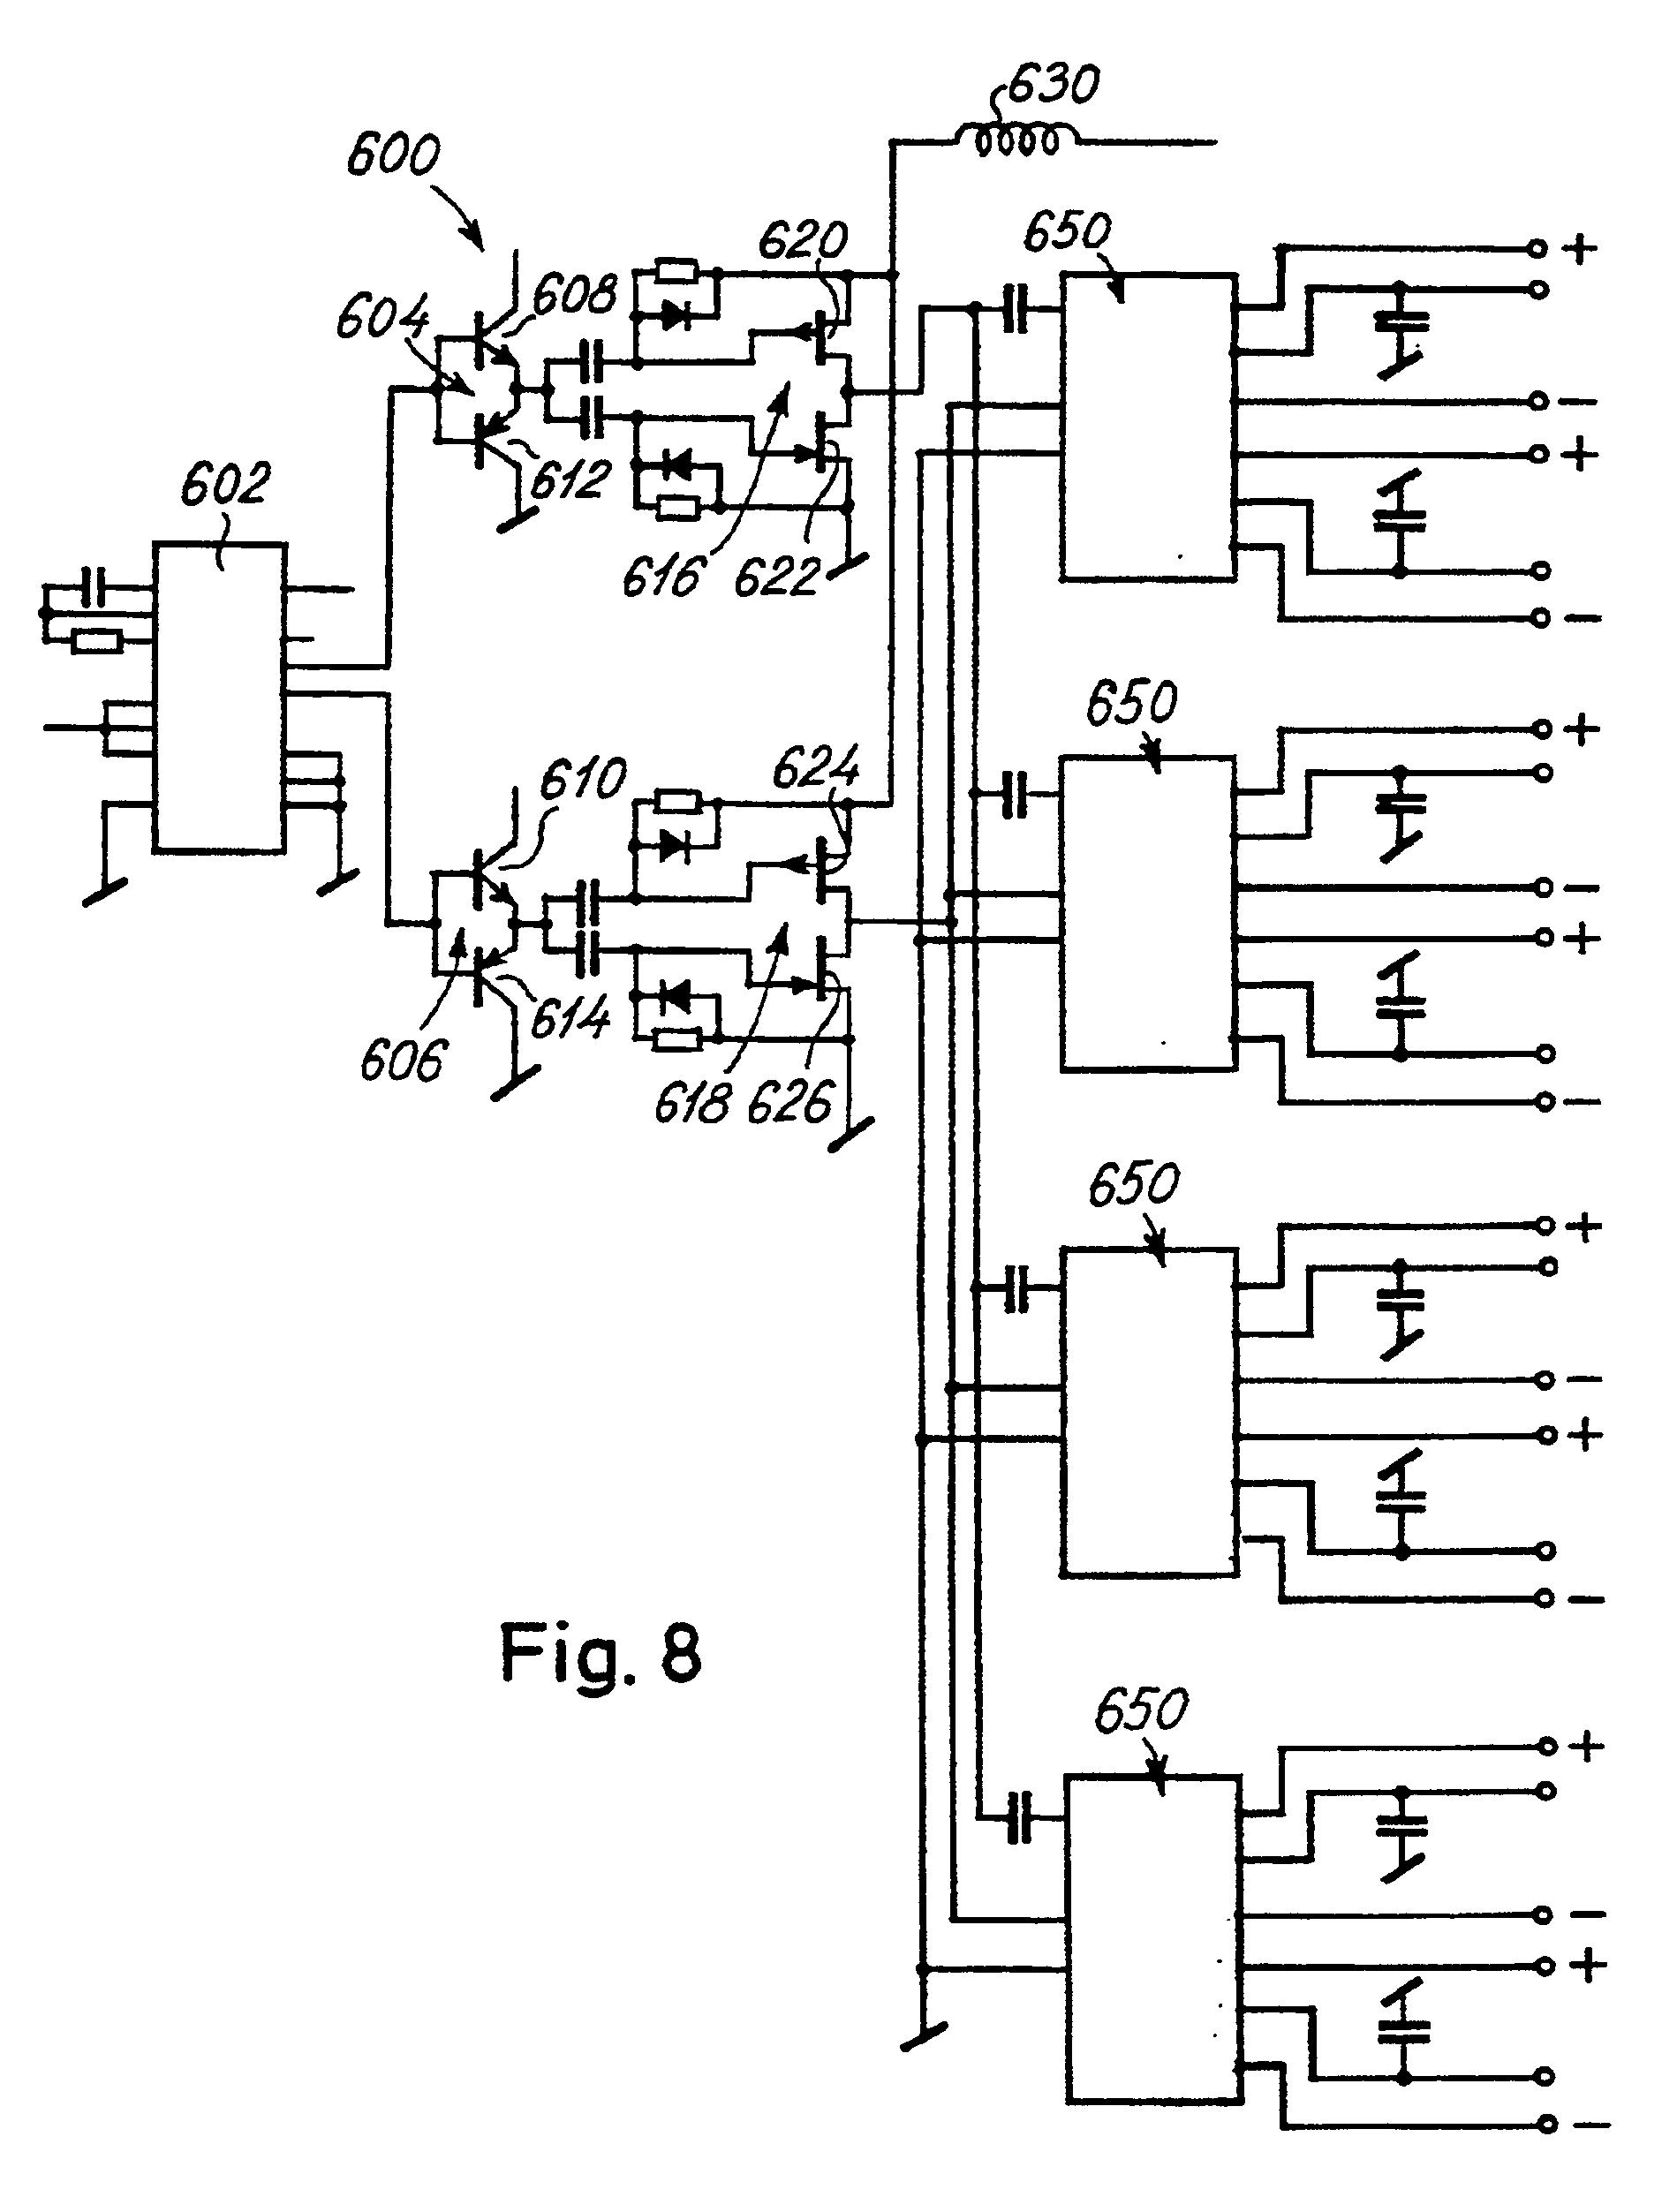 wiring diagram for surround sound system